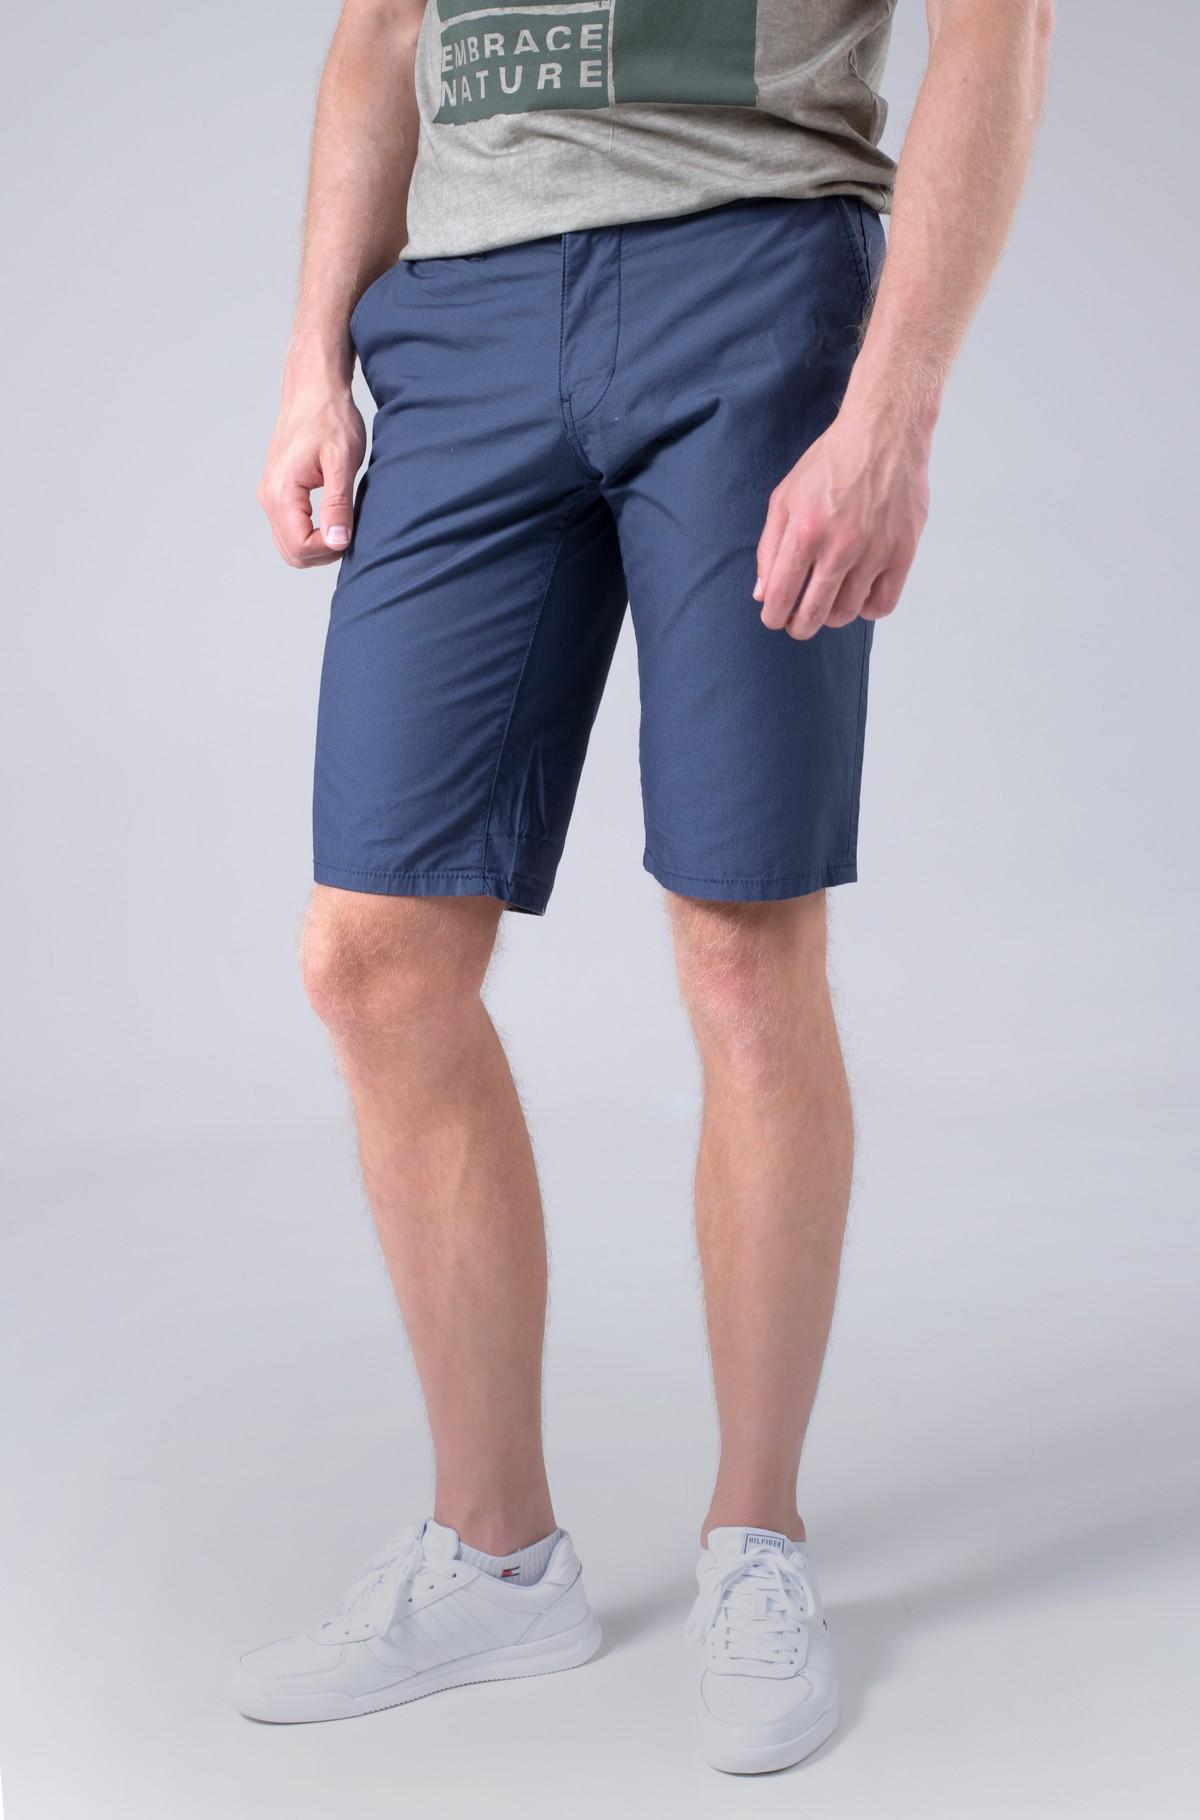 Shorts 101-1220-full-1